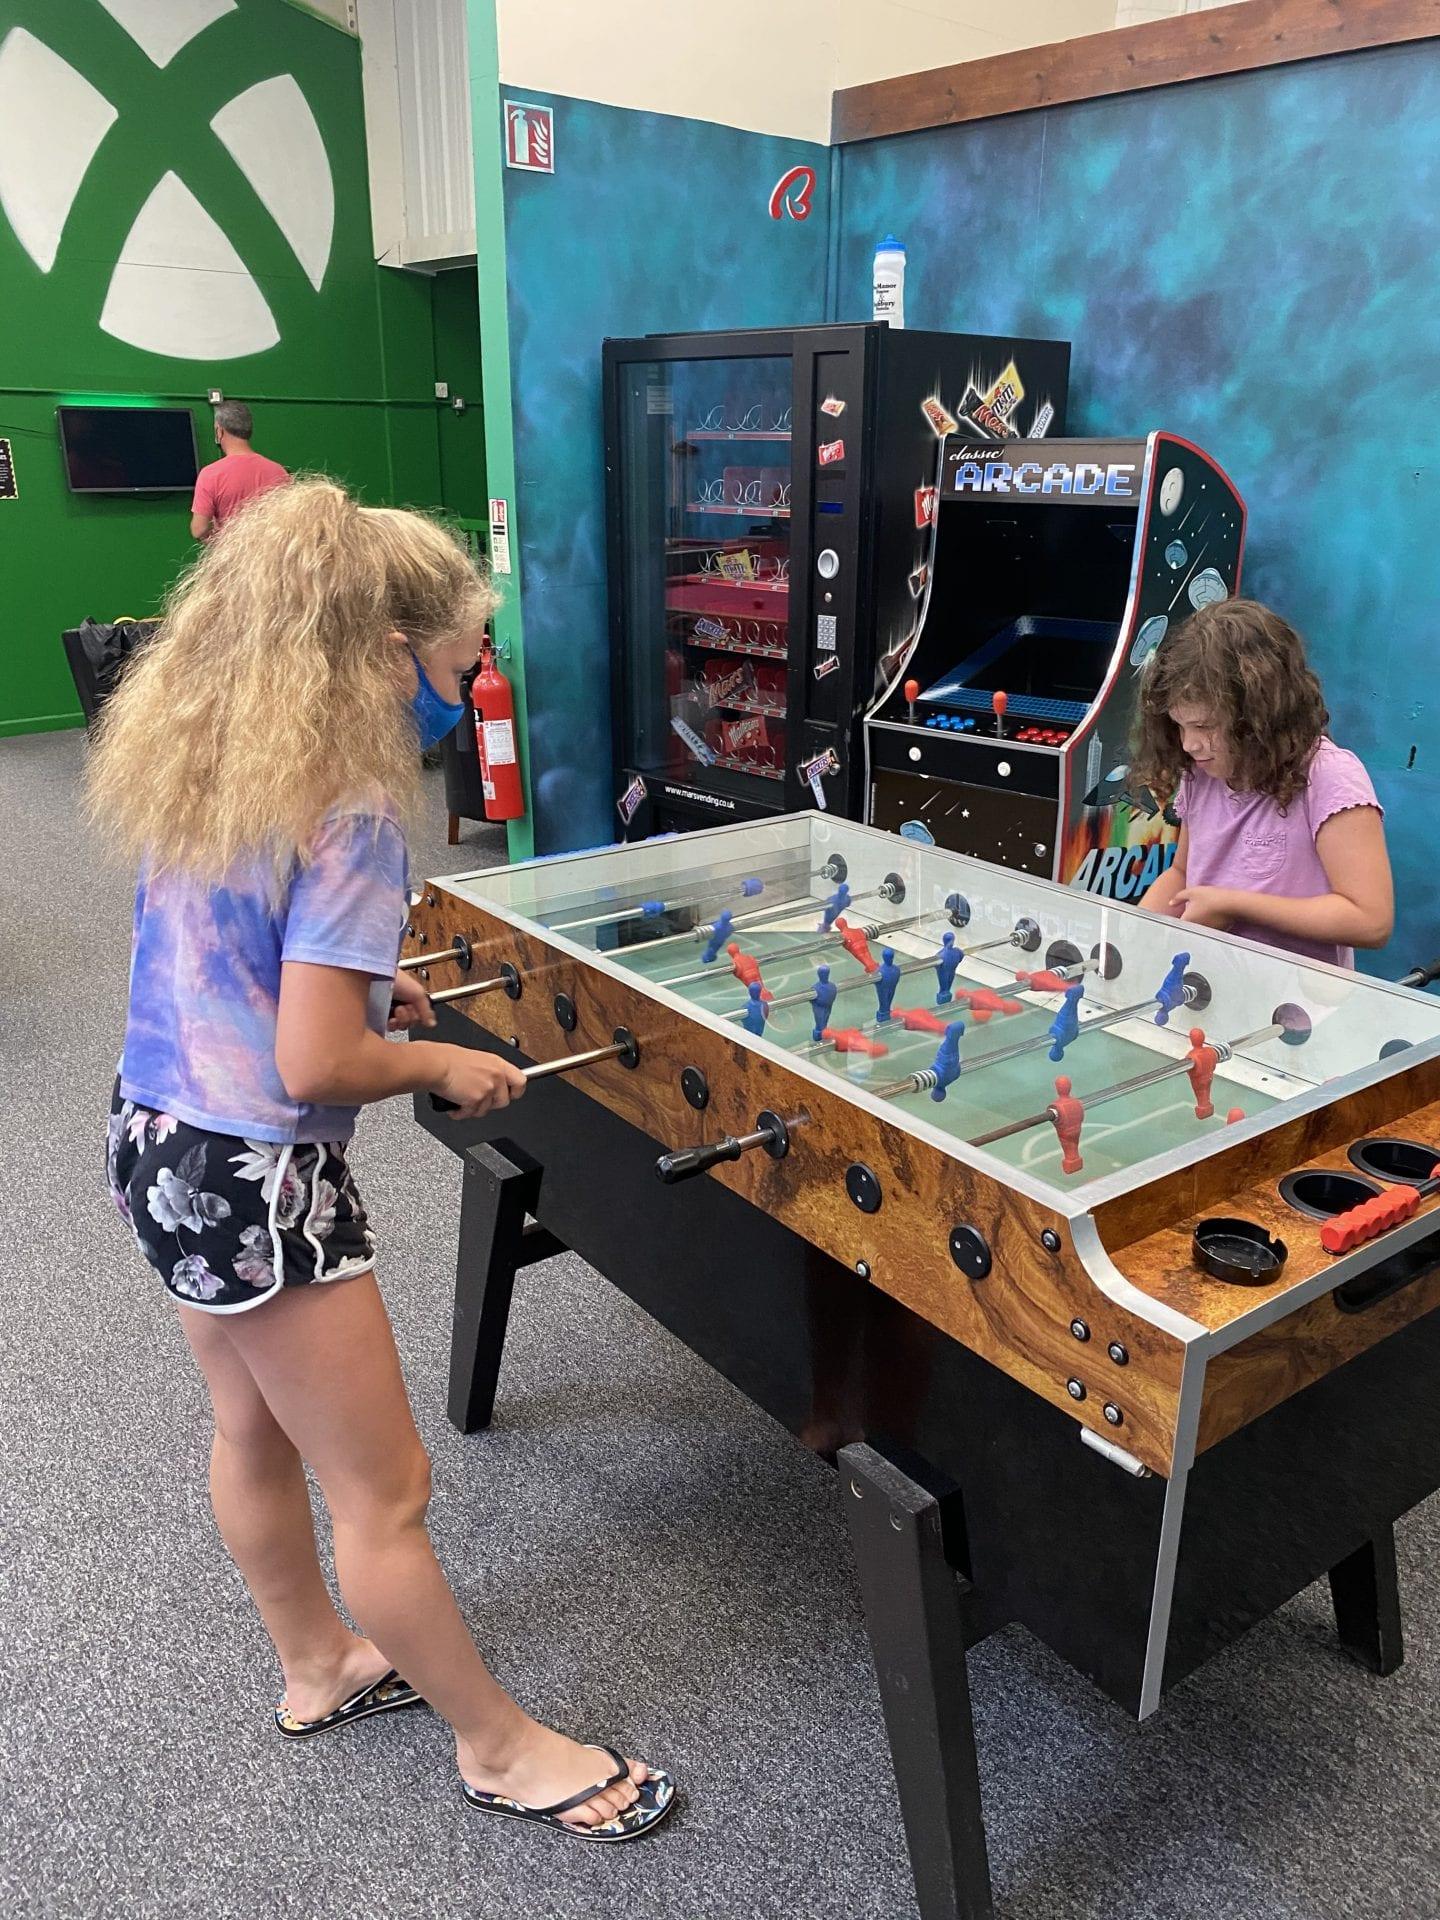 2 girls playing table football